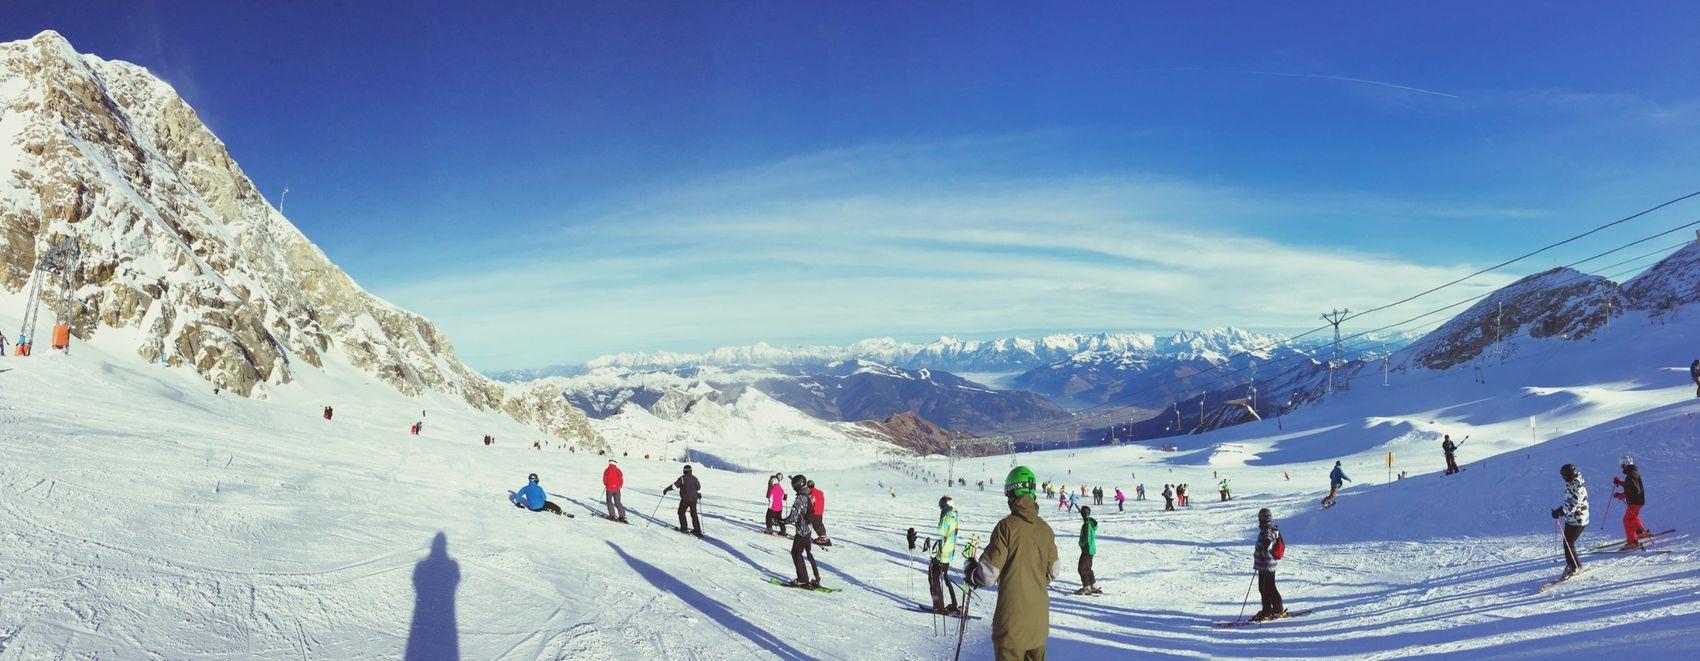 Skiing Snow Enjoying The Sun Sky Enjoying Life Winter Mauntains Landscape